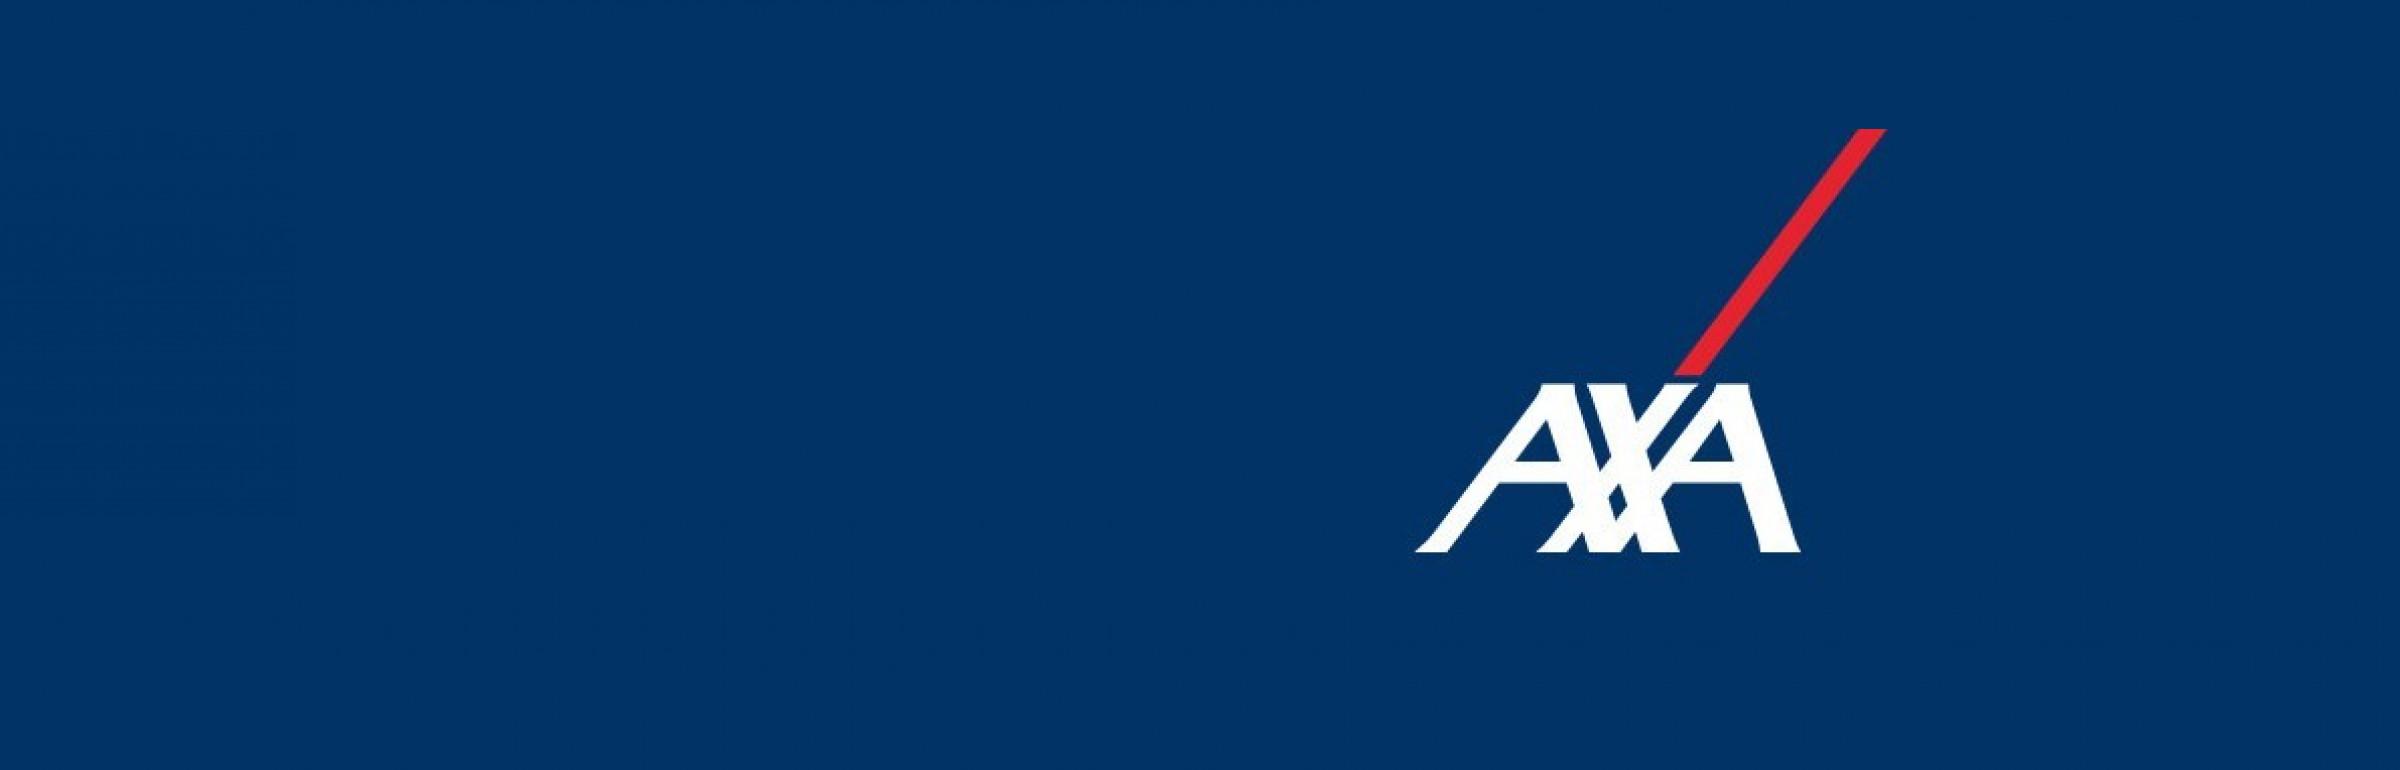 Banner Axa